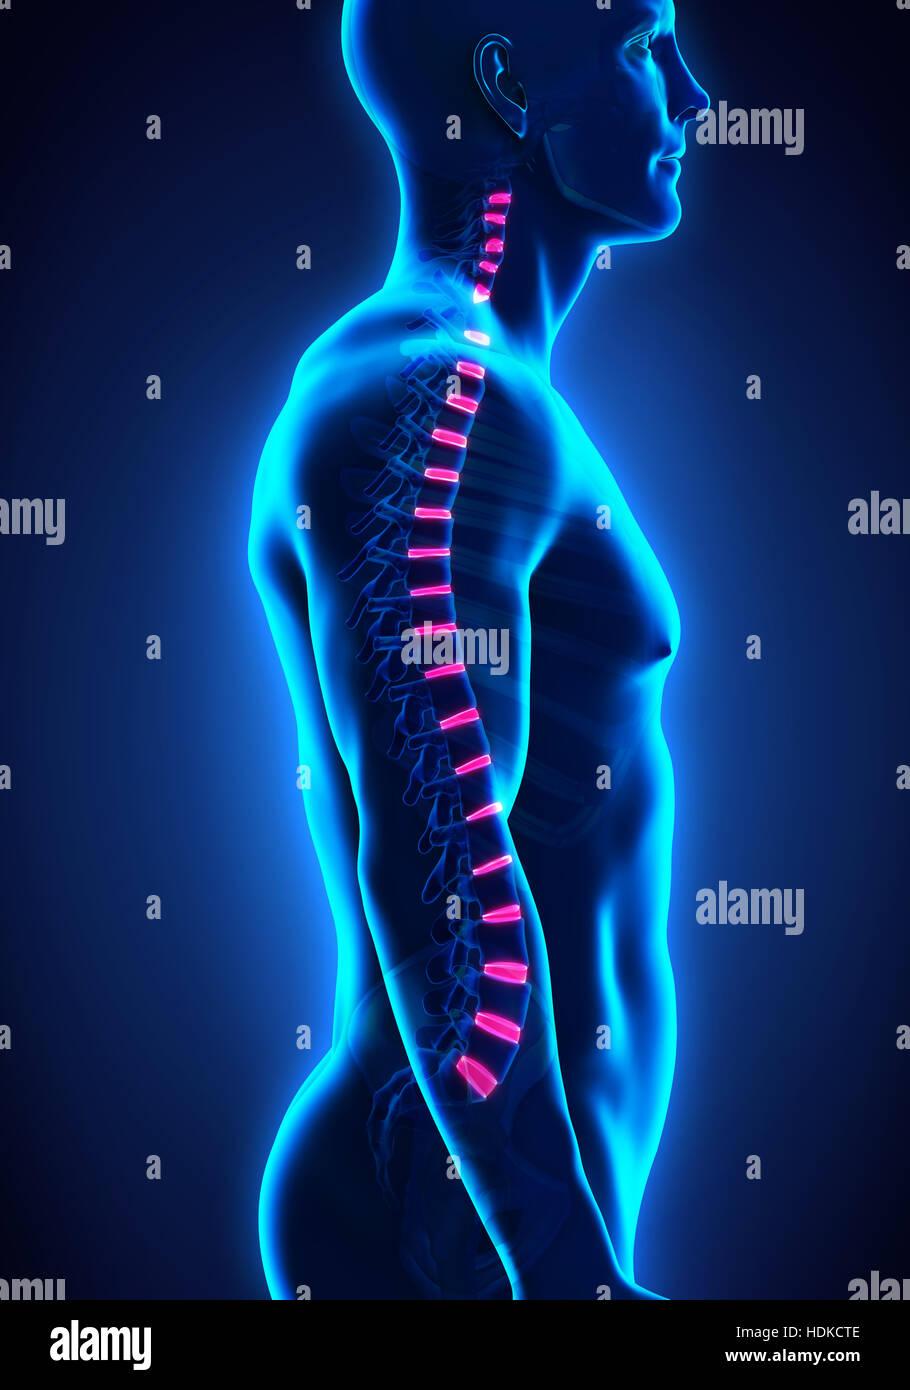 Backbone Intervertebral Disc Anatomy - Stock Image